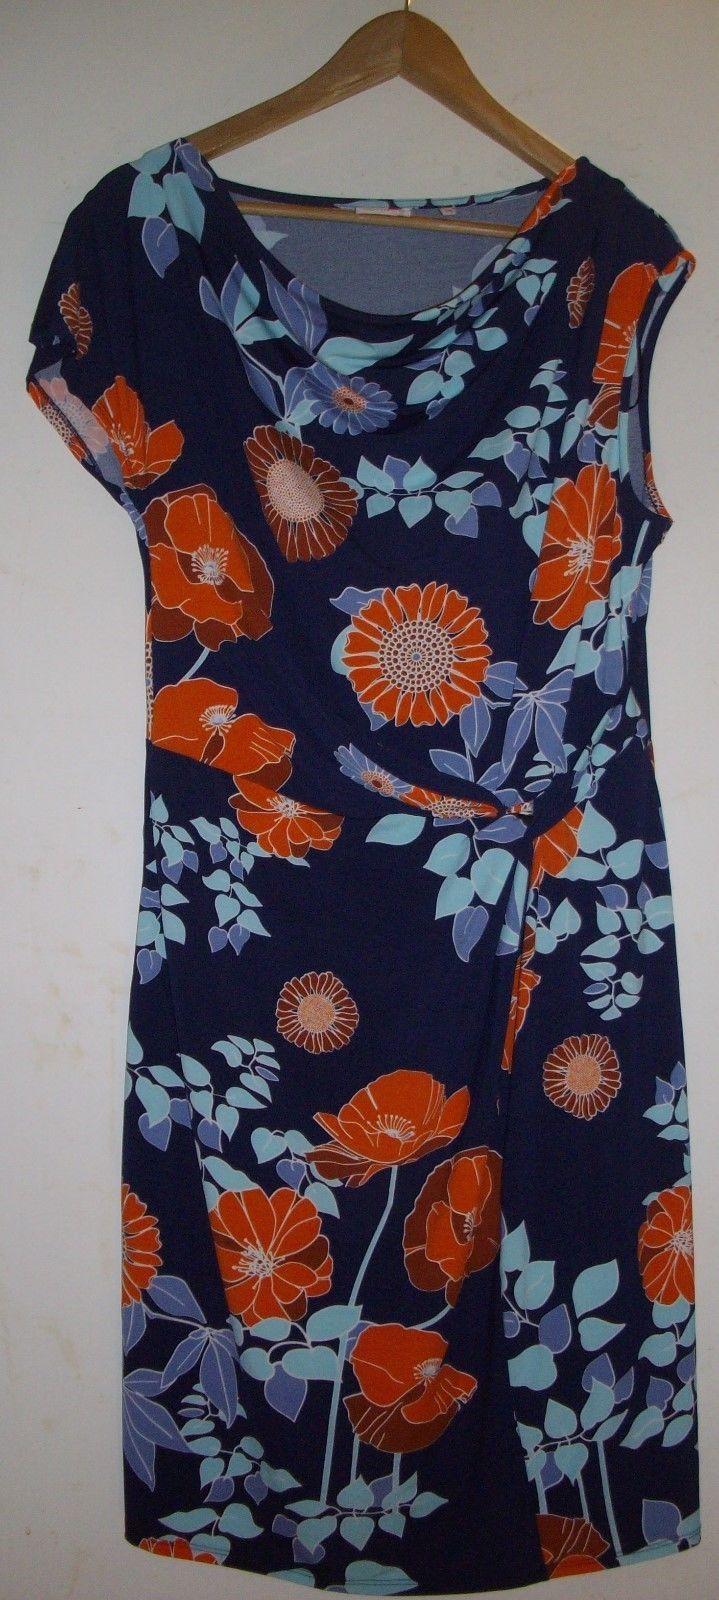 Leona By Leona Edmiston Stretchy Multi Coloured Polyester Dress - Size 14 | eBay